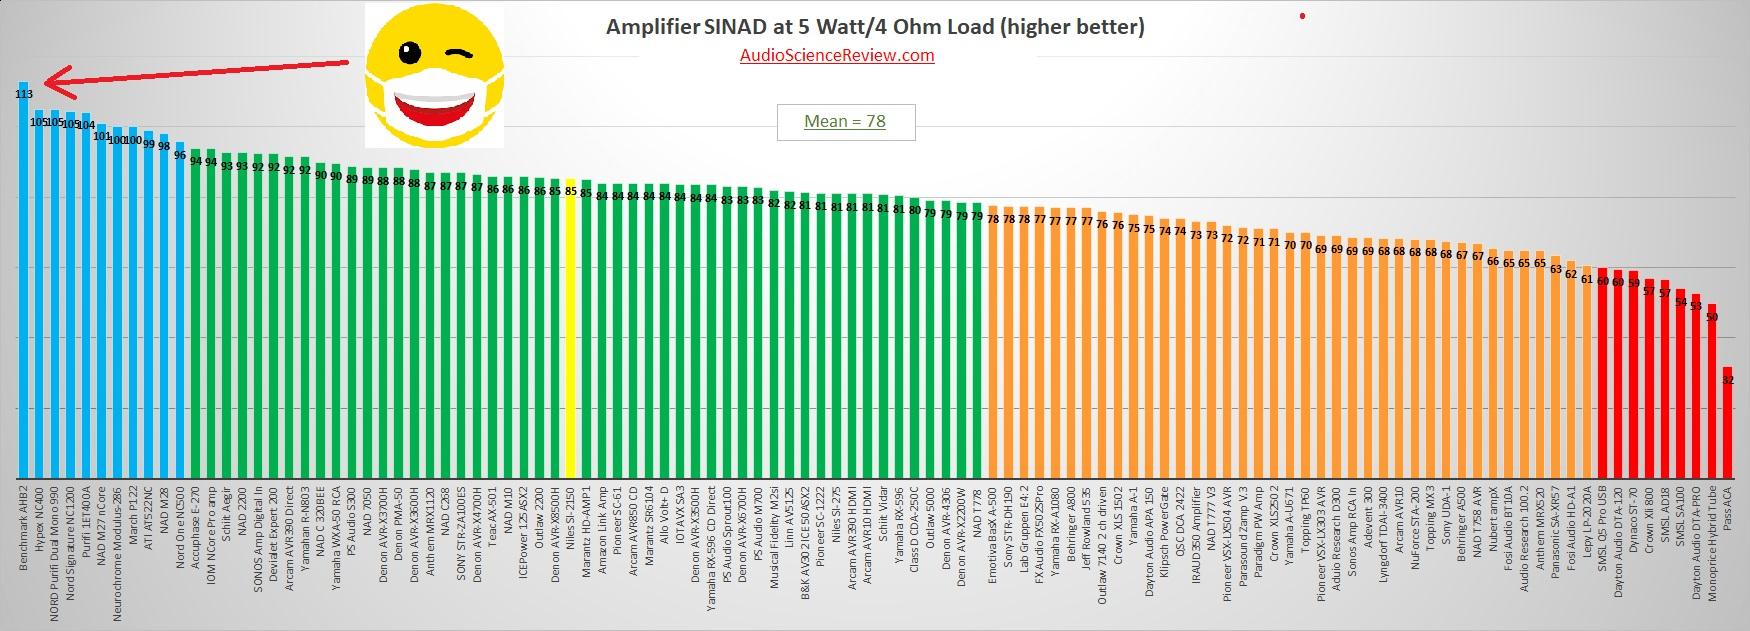 Best stereo amplifie review 2020.jpg